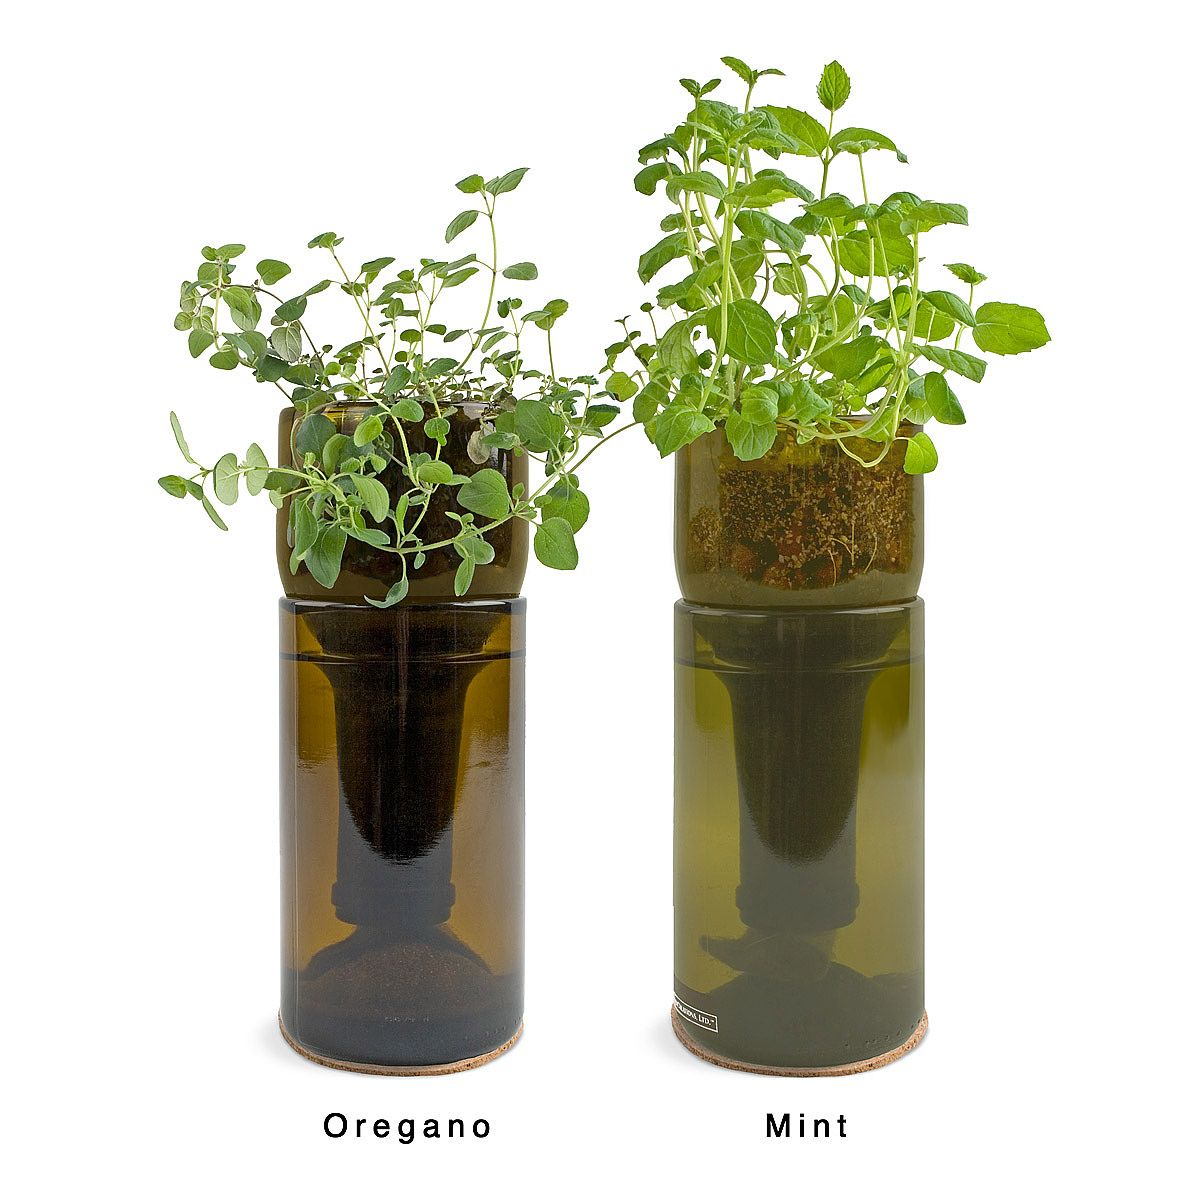 Growbottle herb garden kit indoor herbs and bottle growbottle indoor herb garden kit wine bottle planter workwithnaturefo